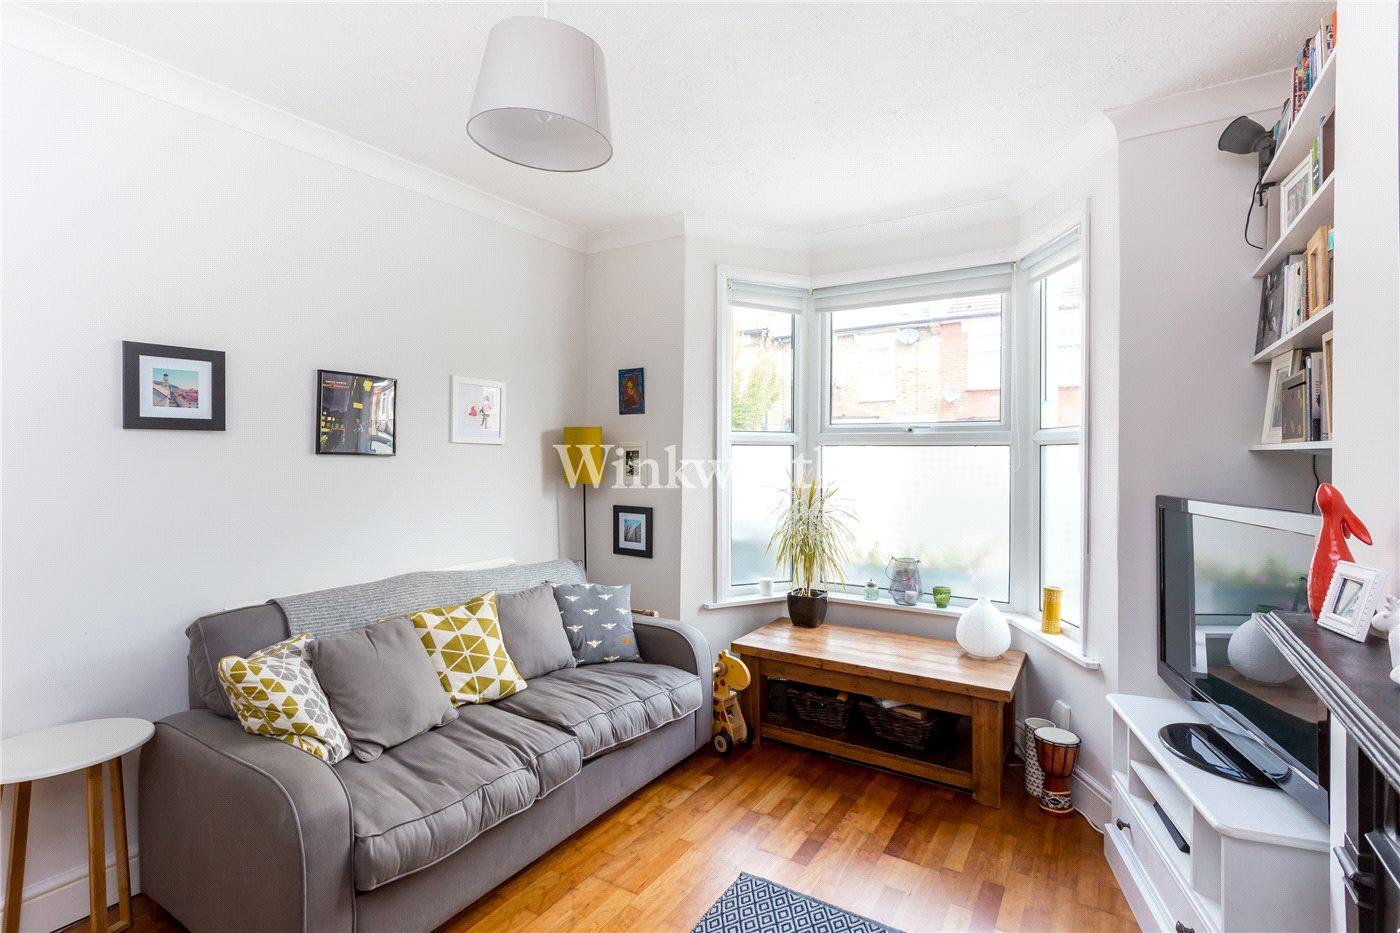 Bedroom property for sale in elmar road seven sisters london